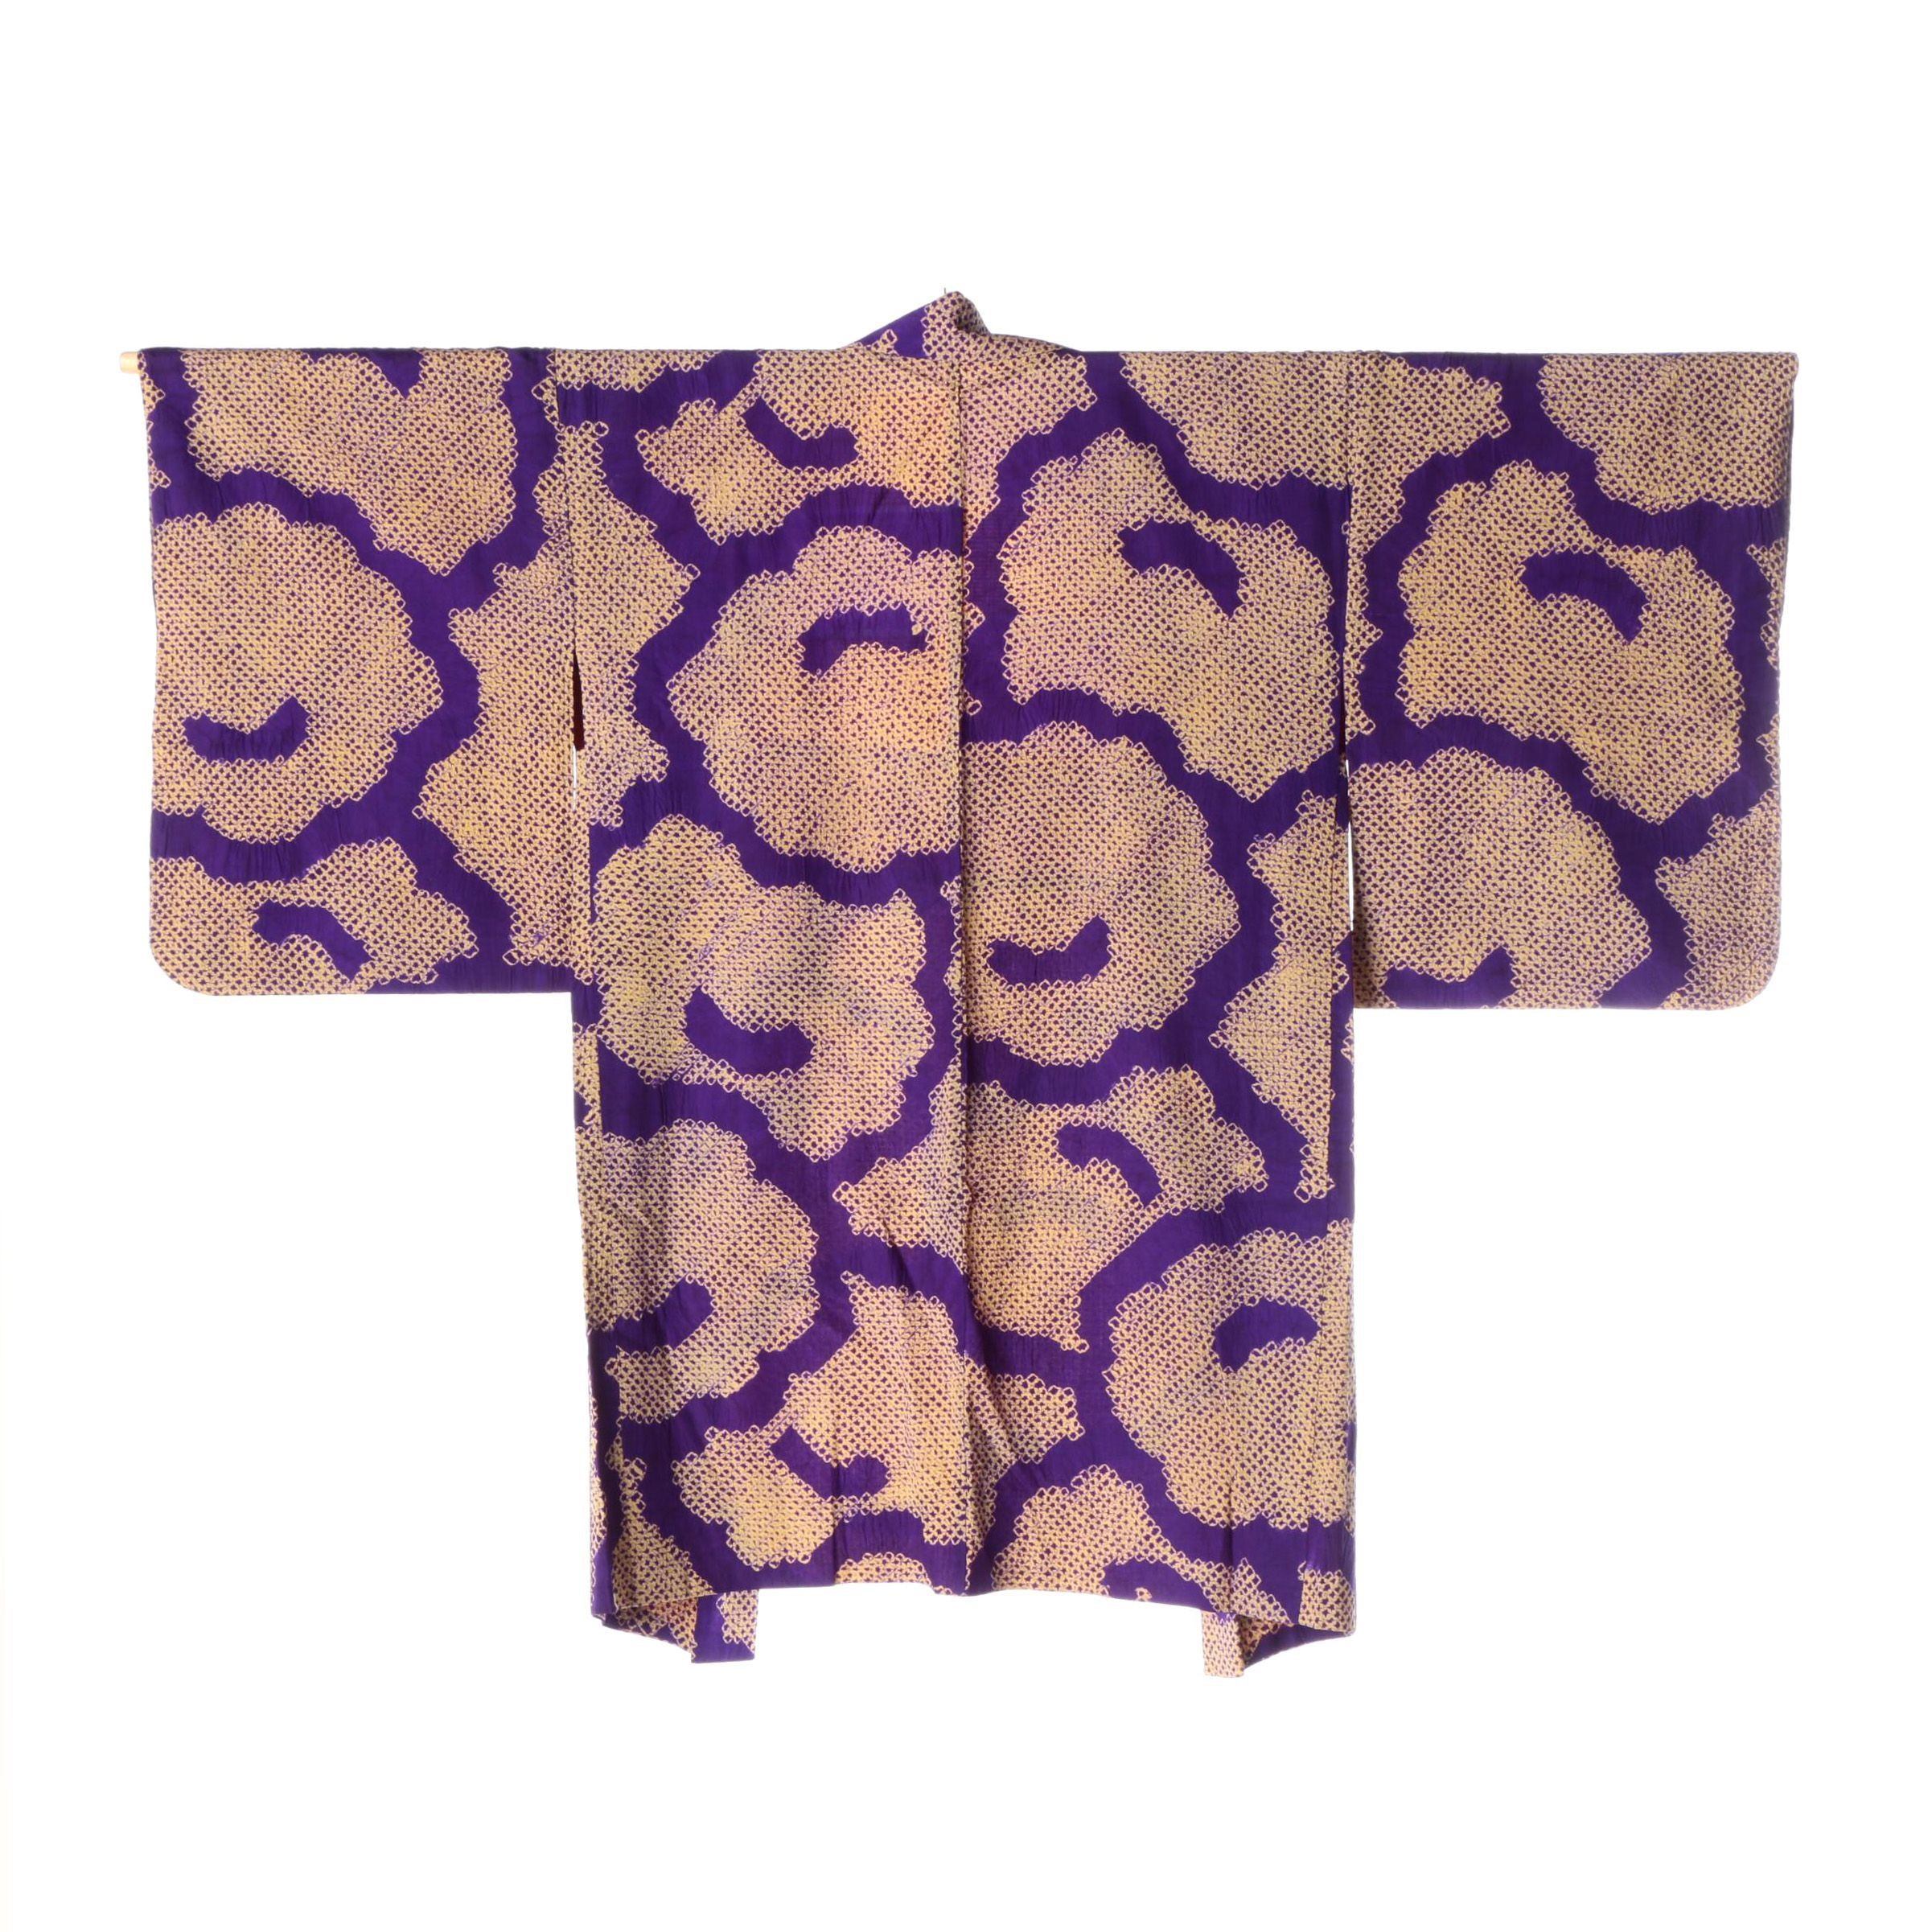 Circa 1930s Vintage Japanese Handwoven Silk Haori Jacket